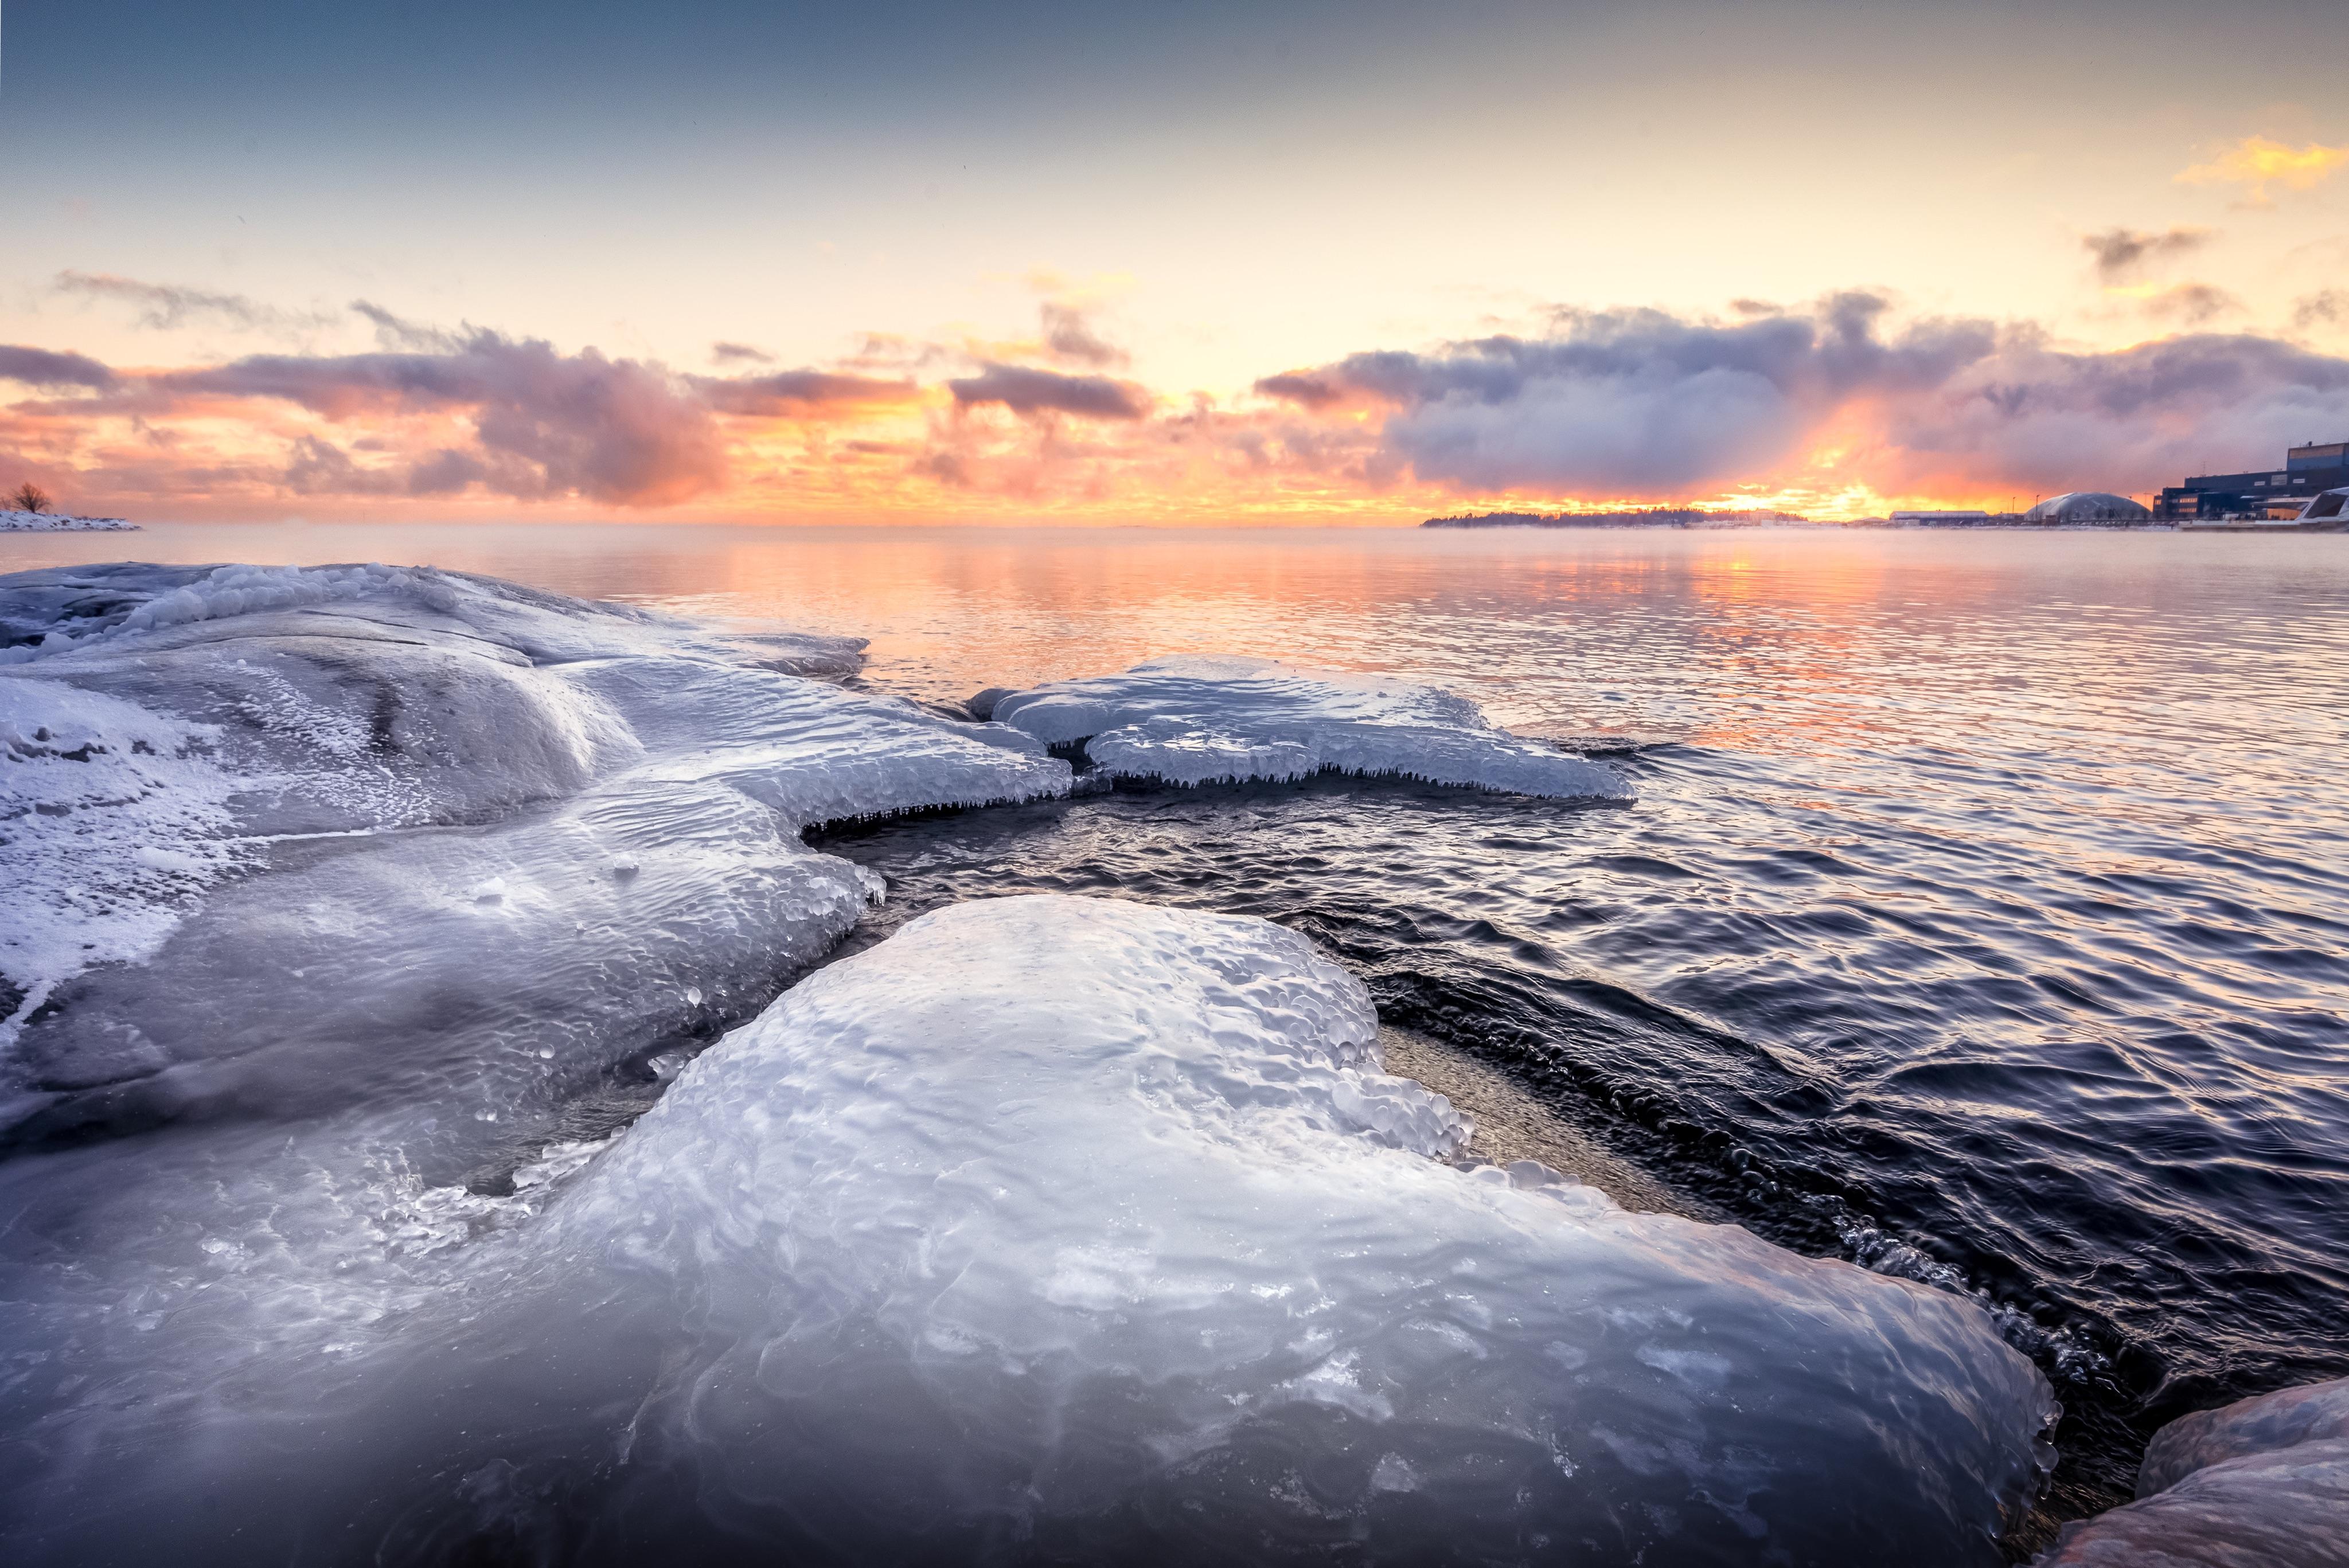 sunset-helsinki-ice-copie-jpg